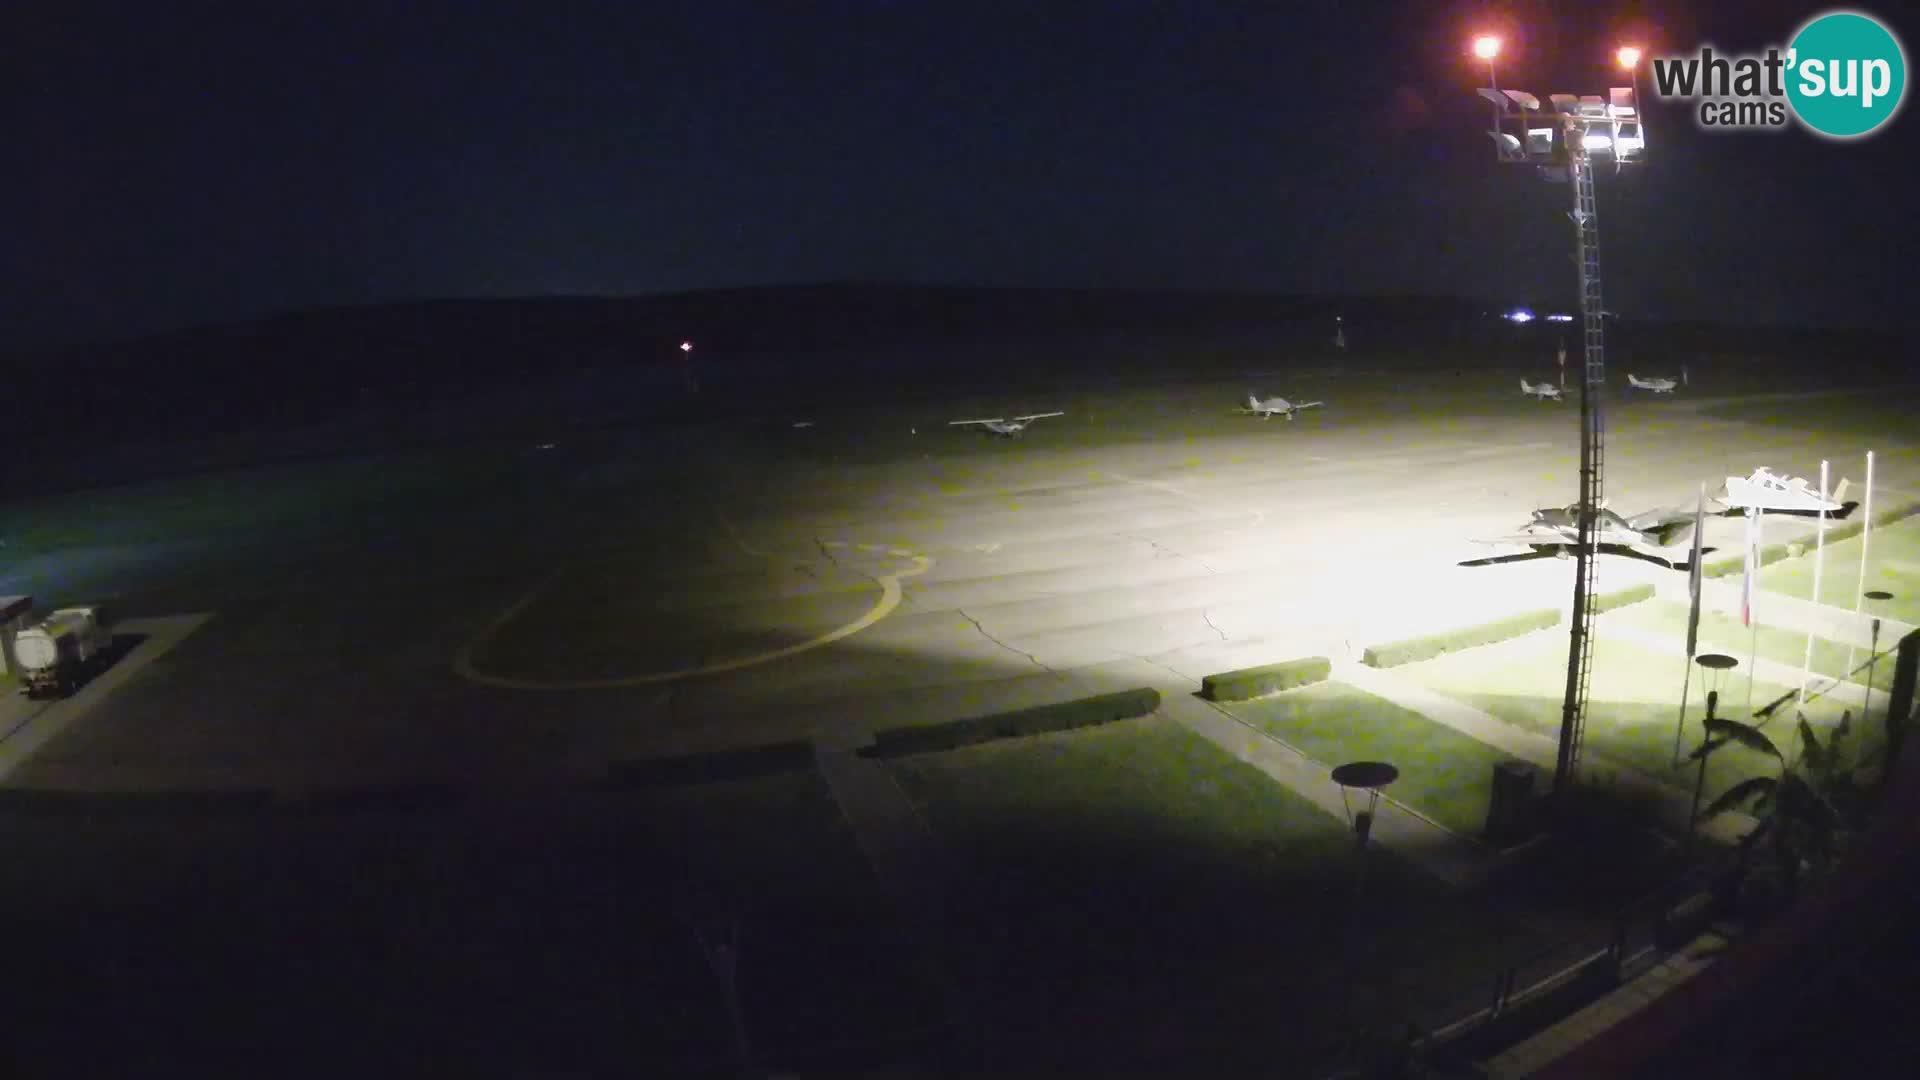 Zračna luka Portorož: LJPZ